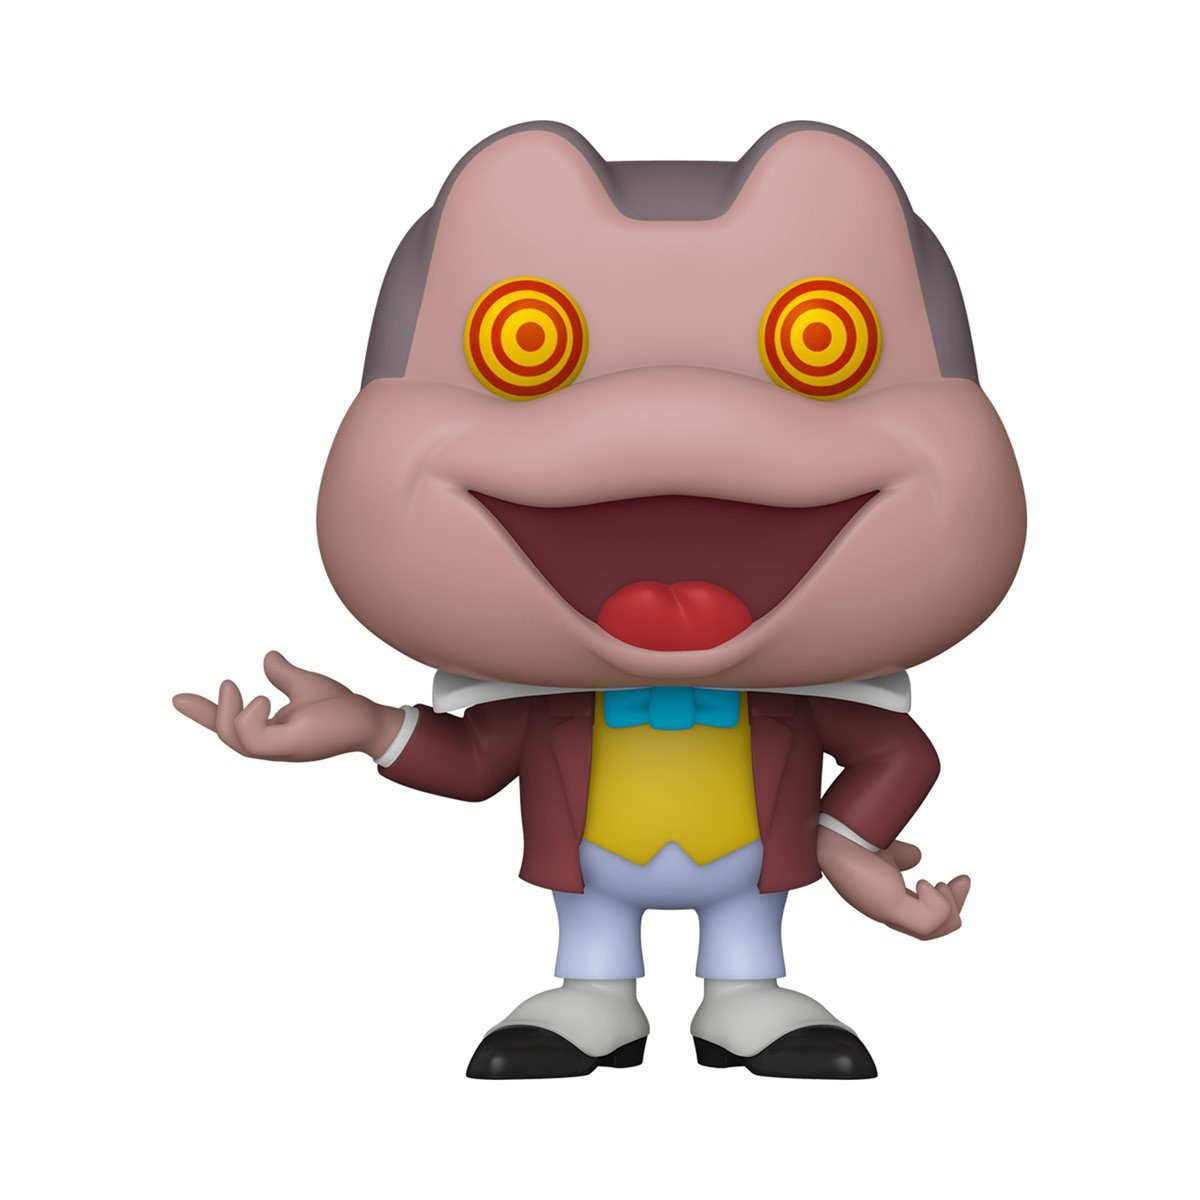 Funko Pop! Mr. Toad: Aniversário de 65 anos da Disneylândia #814 - Funko